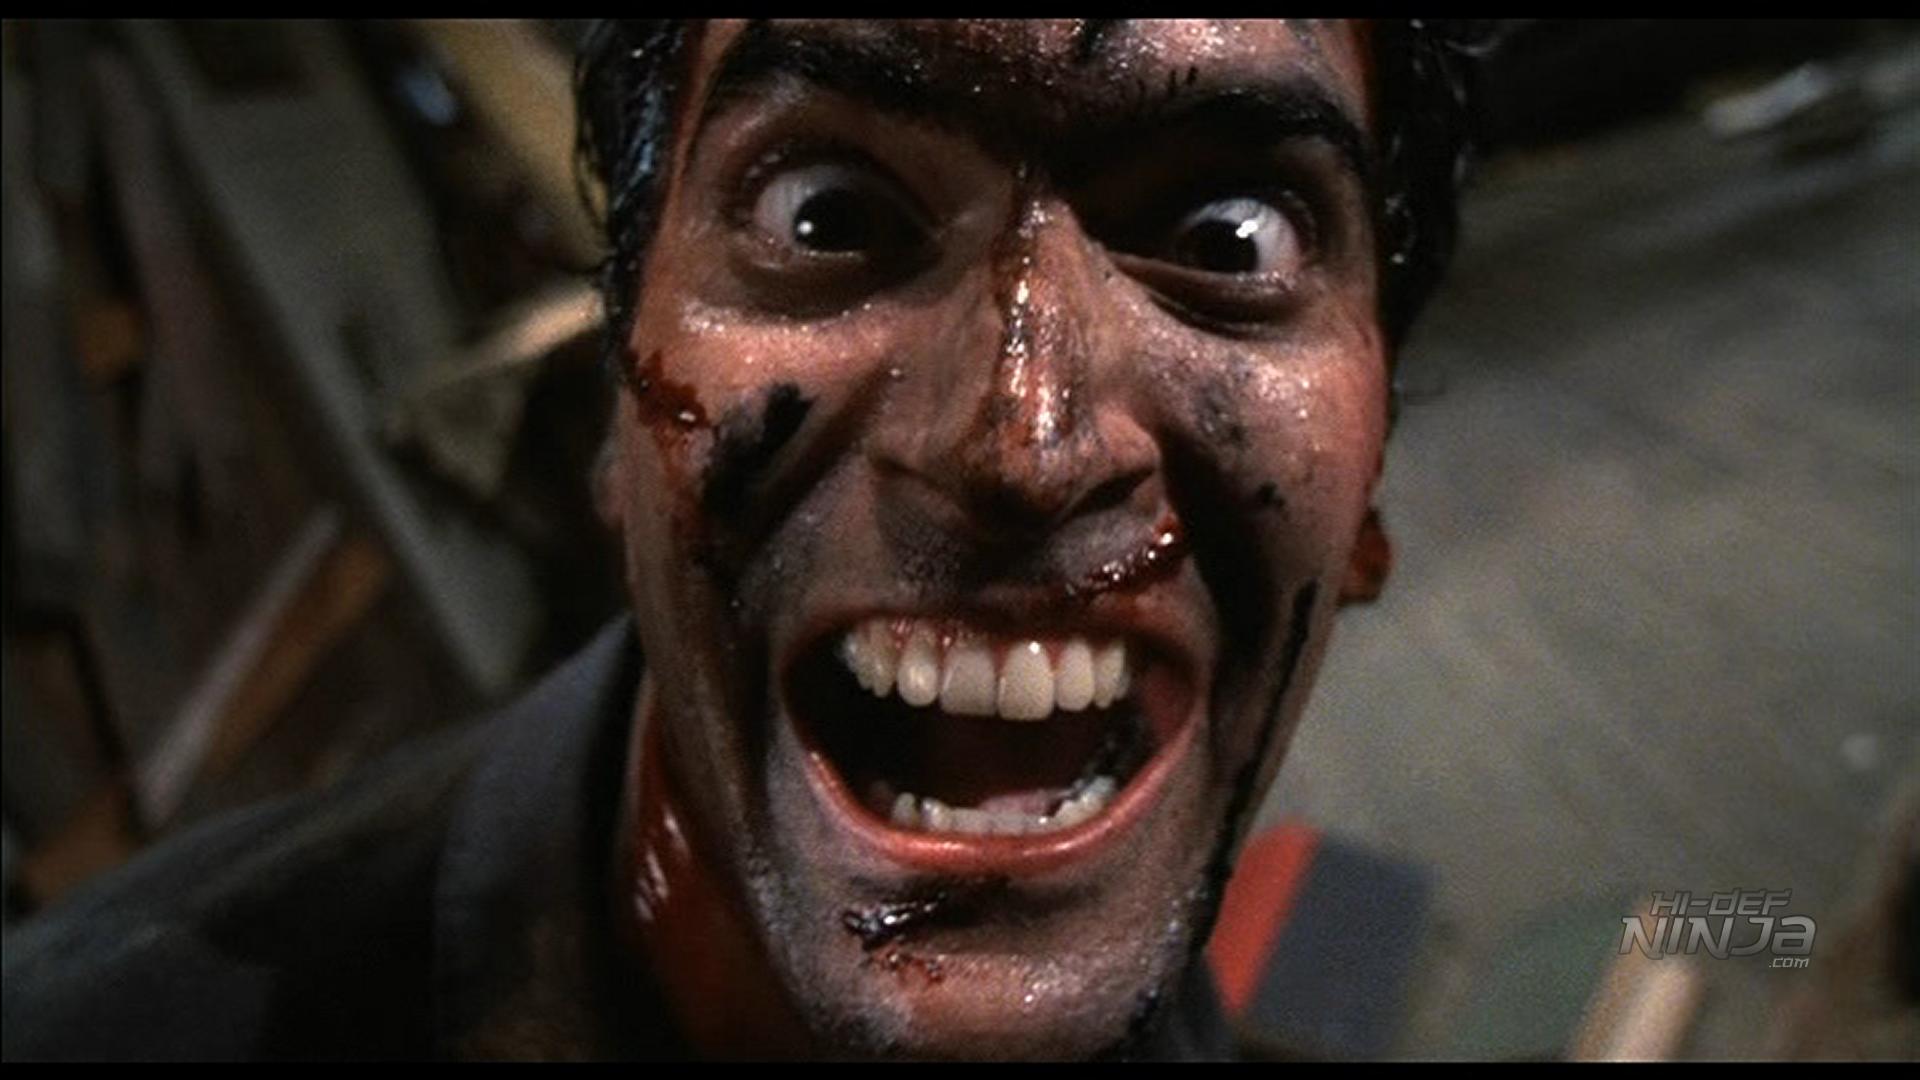 [UK] Evil Dead 2 Blu-Ray Review | Hi-Def Ninja - Blu-ray ...  [UK] Evil Dead ...